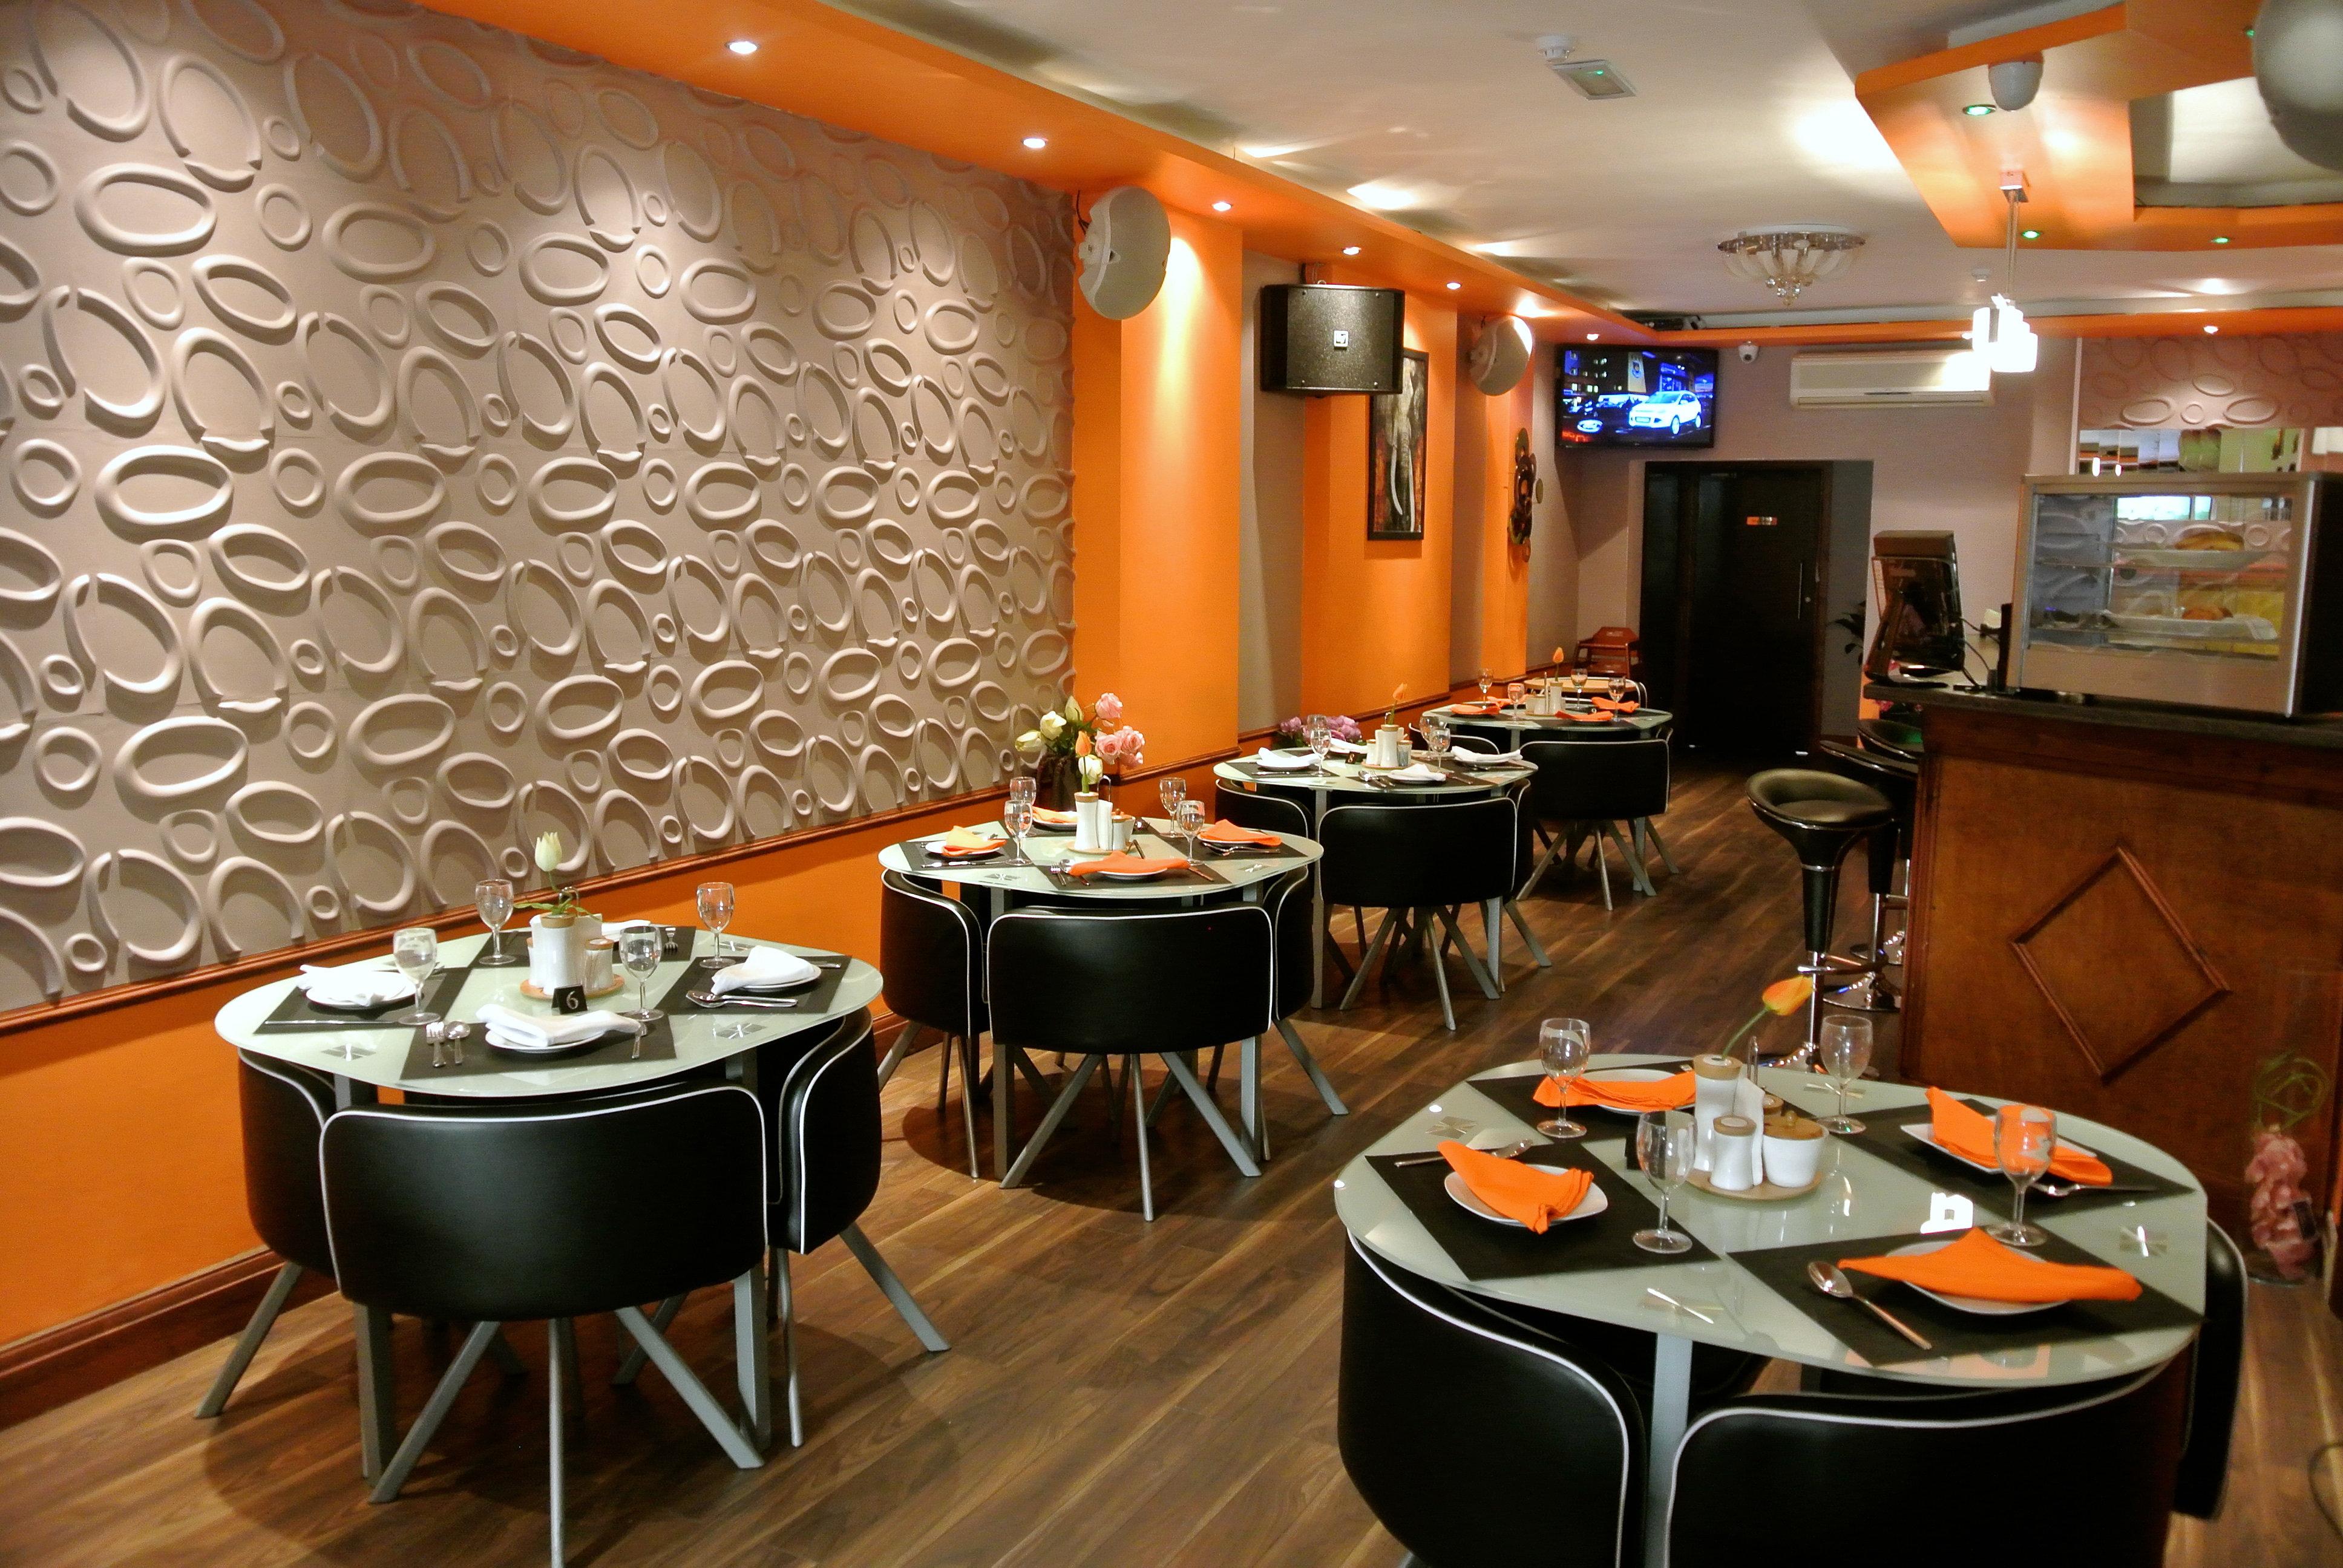 280 degrees african restaurant nigerian restaurant dsc for African cuisine restaurants